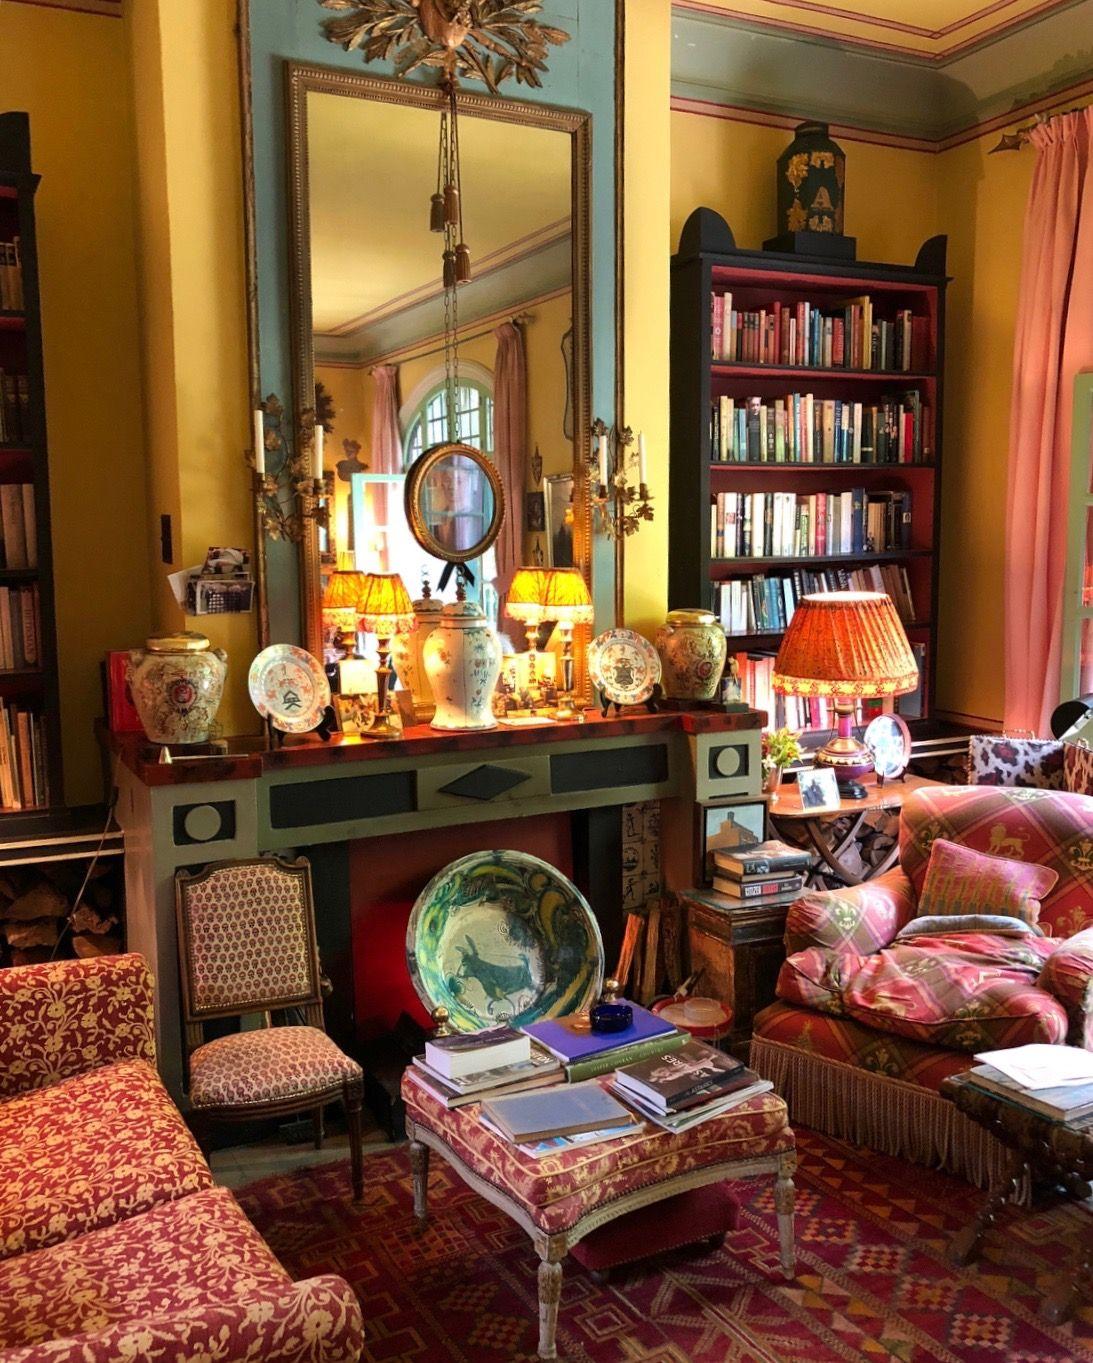 Regal looking sitting room cozy nook arredamento for Faccende domestiche in inglese